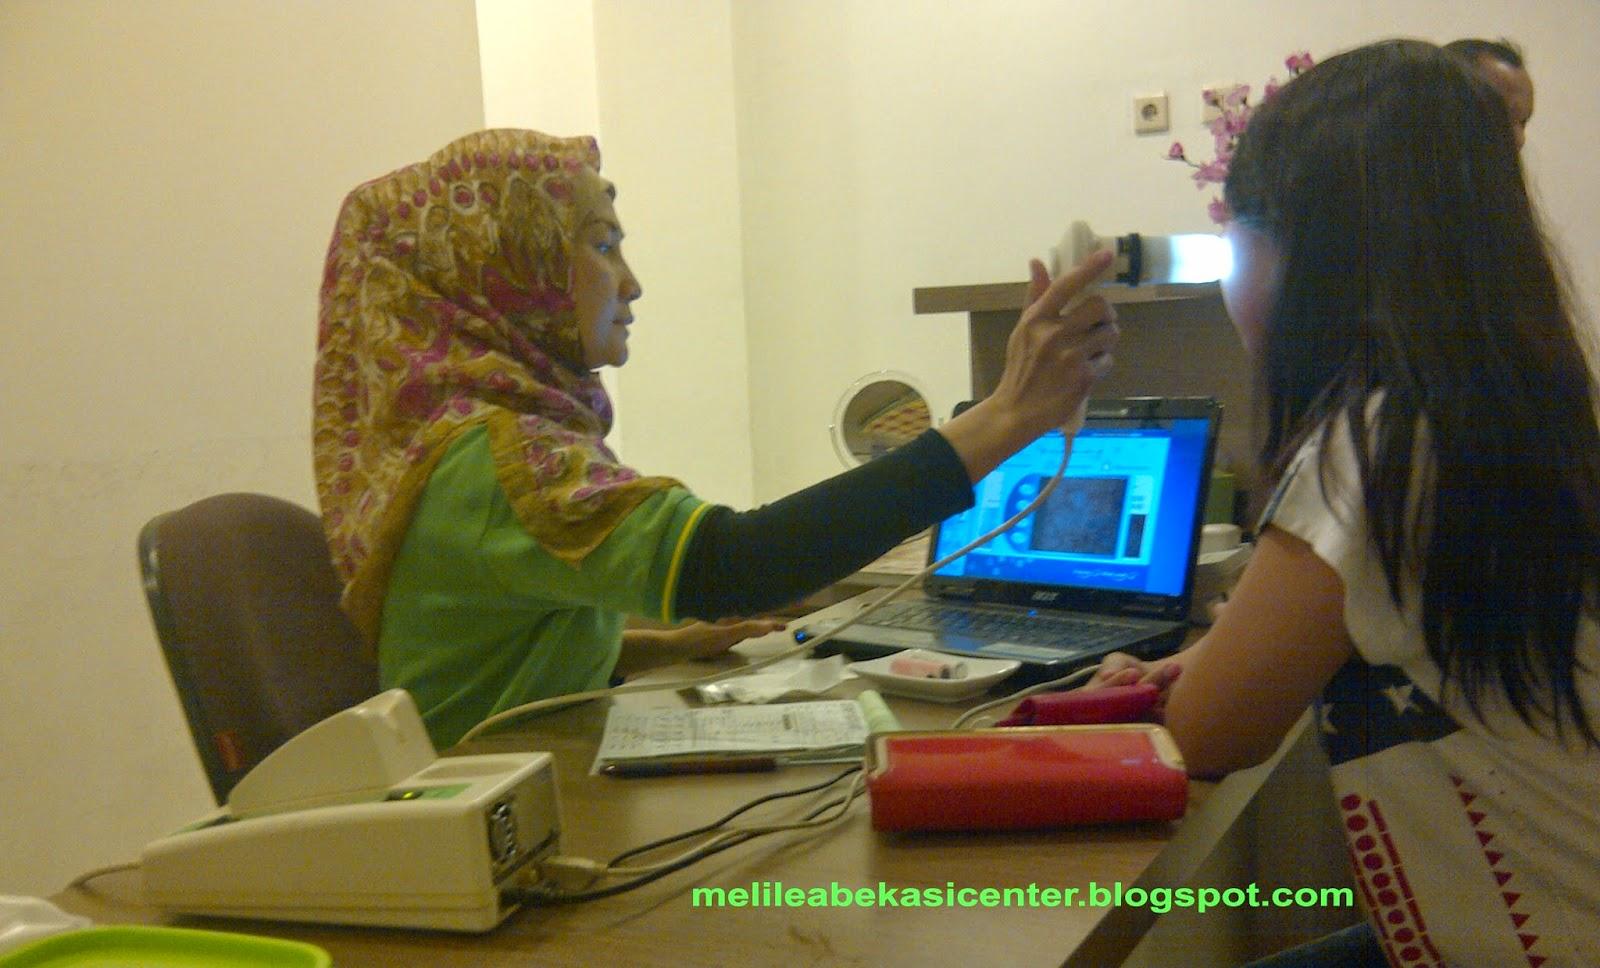 Produk Melilea Indonesia Bekasi